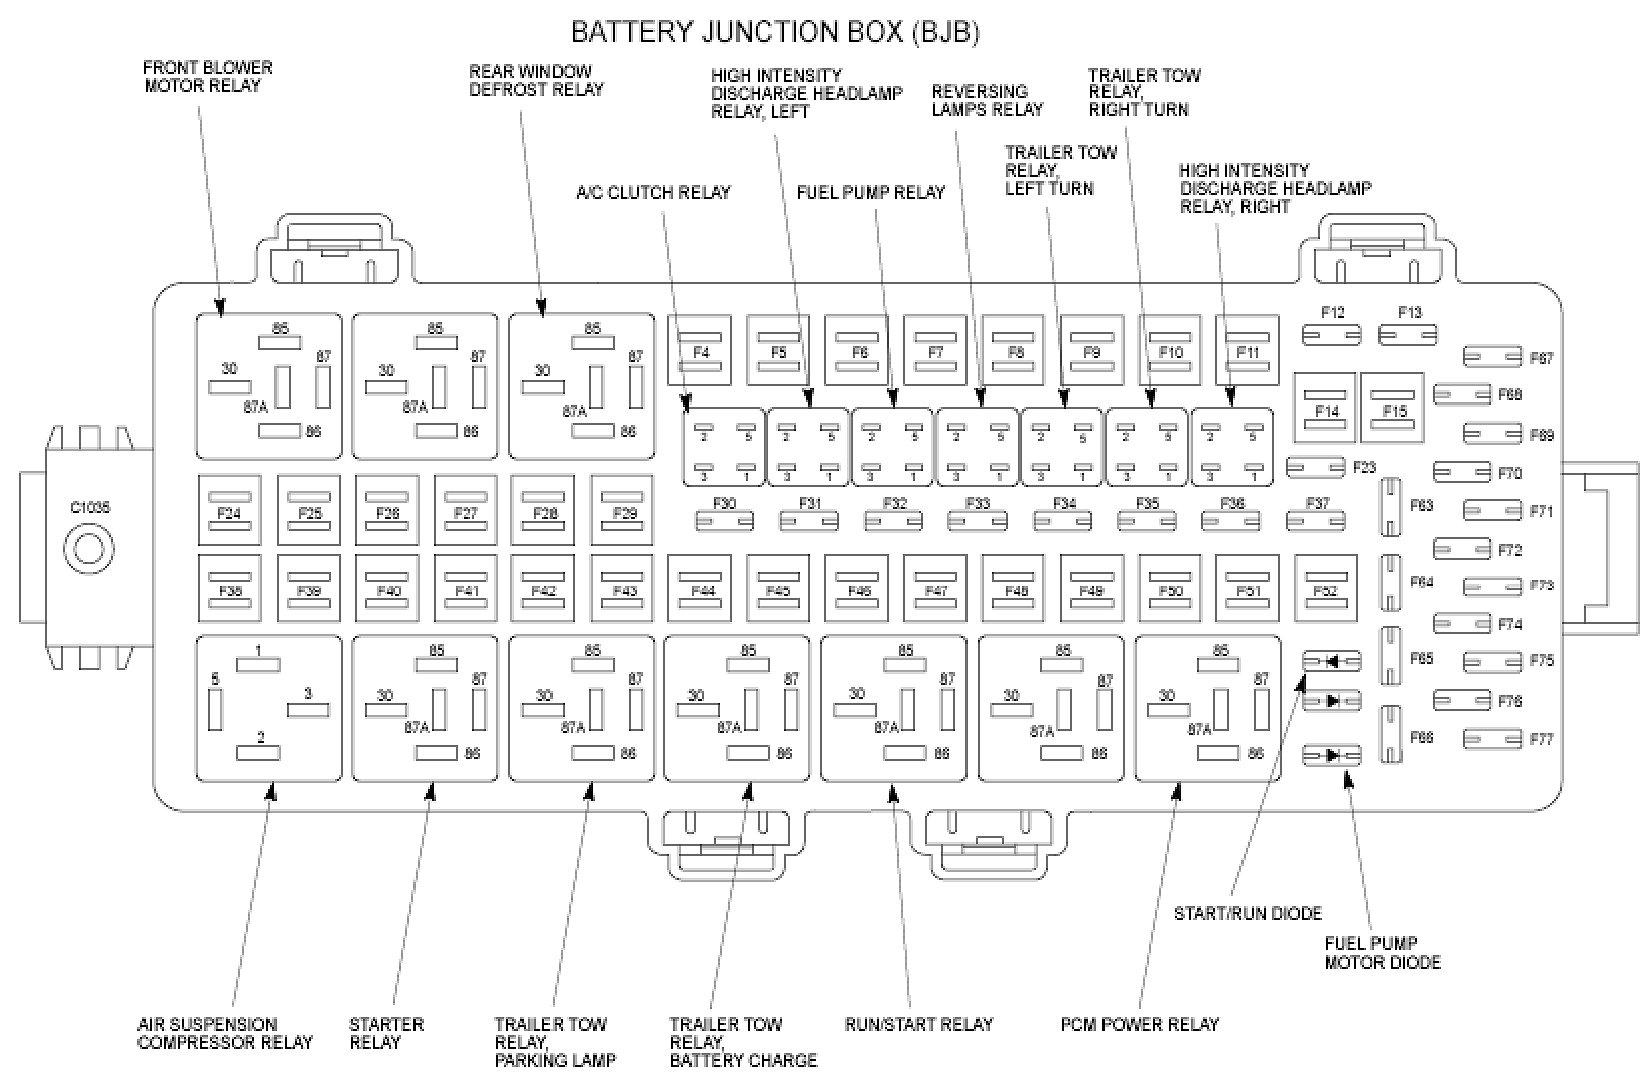 2007 f350 fuse panel diagram visio wiring ford edge data schema box explorer